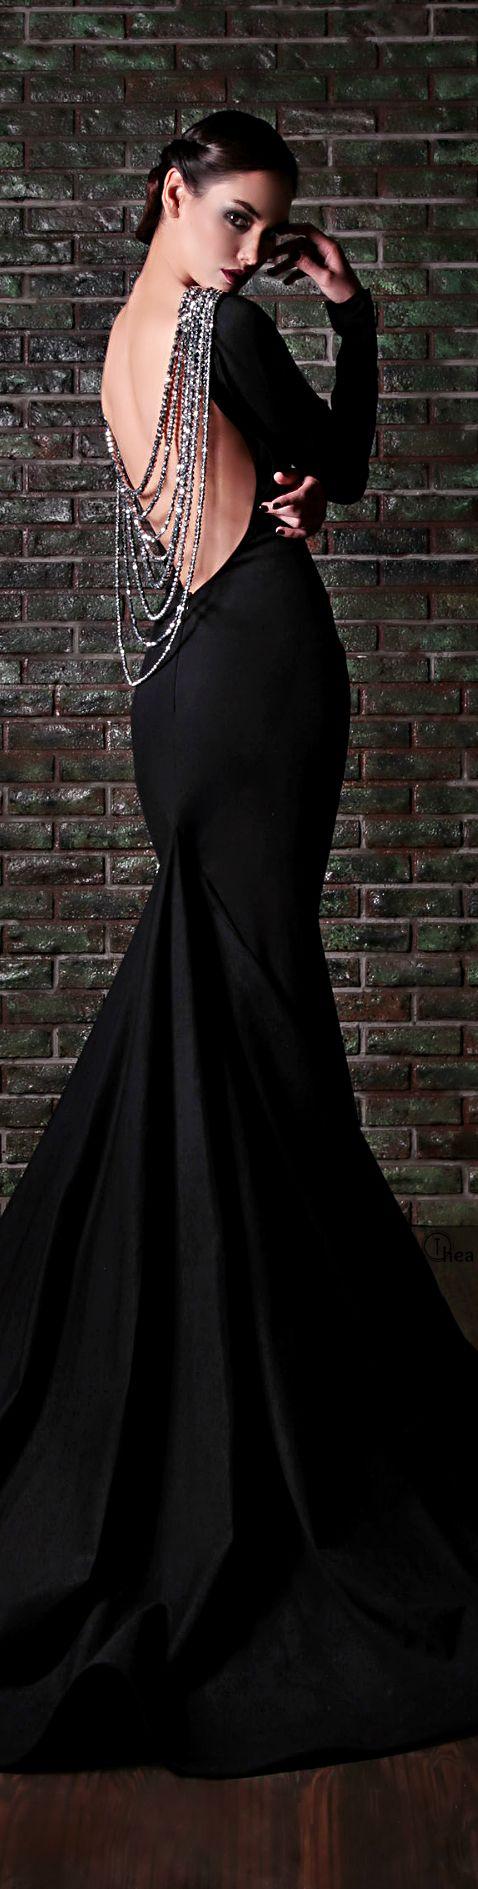 Rami Kadi Couture Fw 2013 2014 Long Black Dress Dresses Beautiful Gowns [ 1889 x 478 Pixel ]